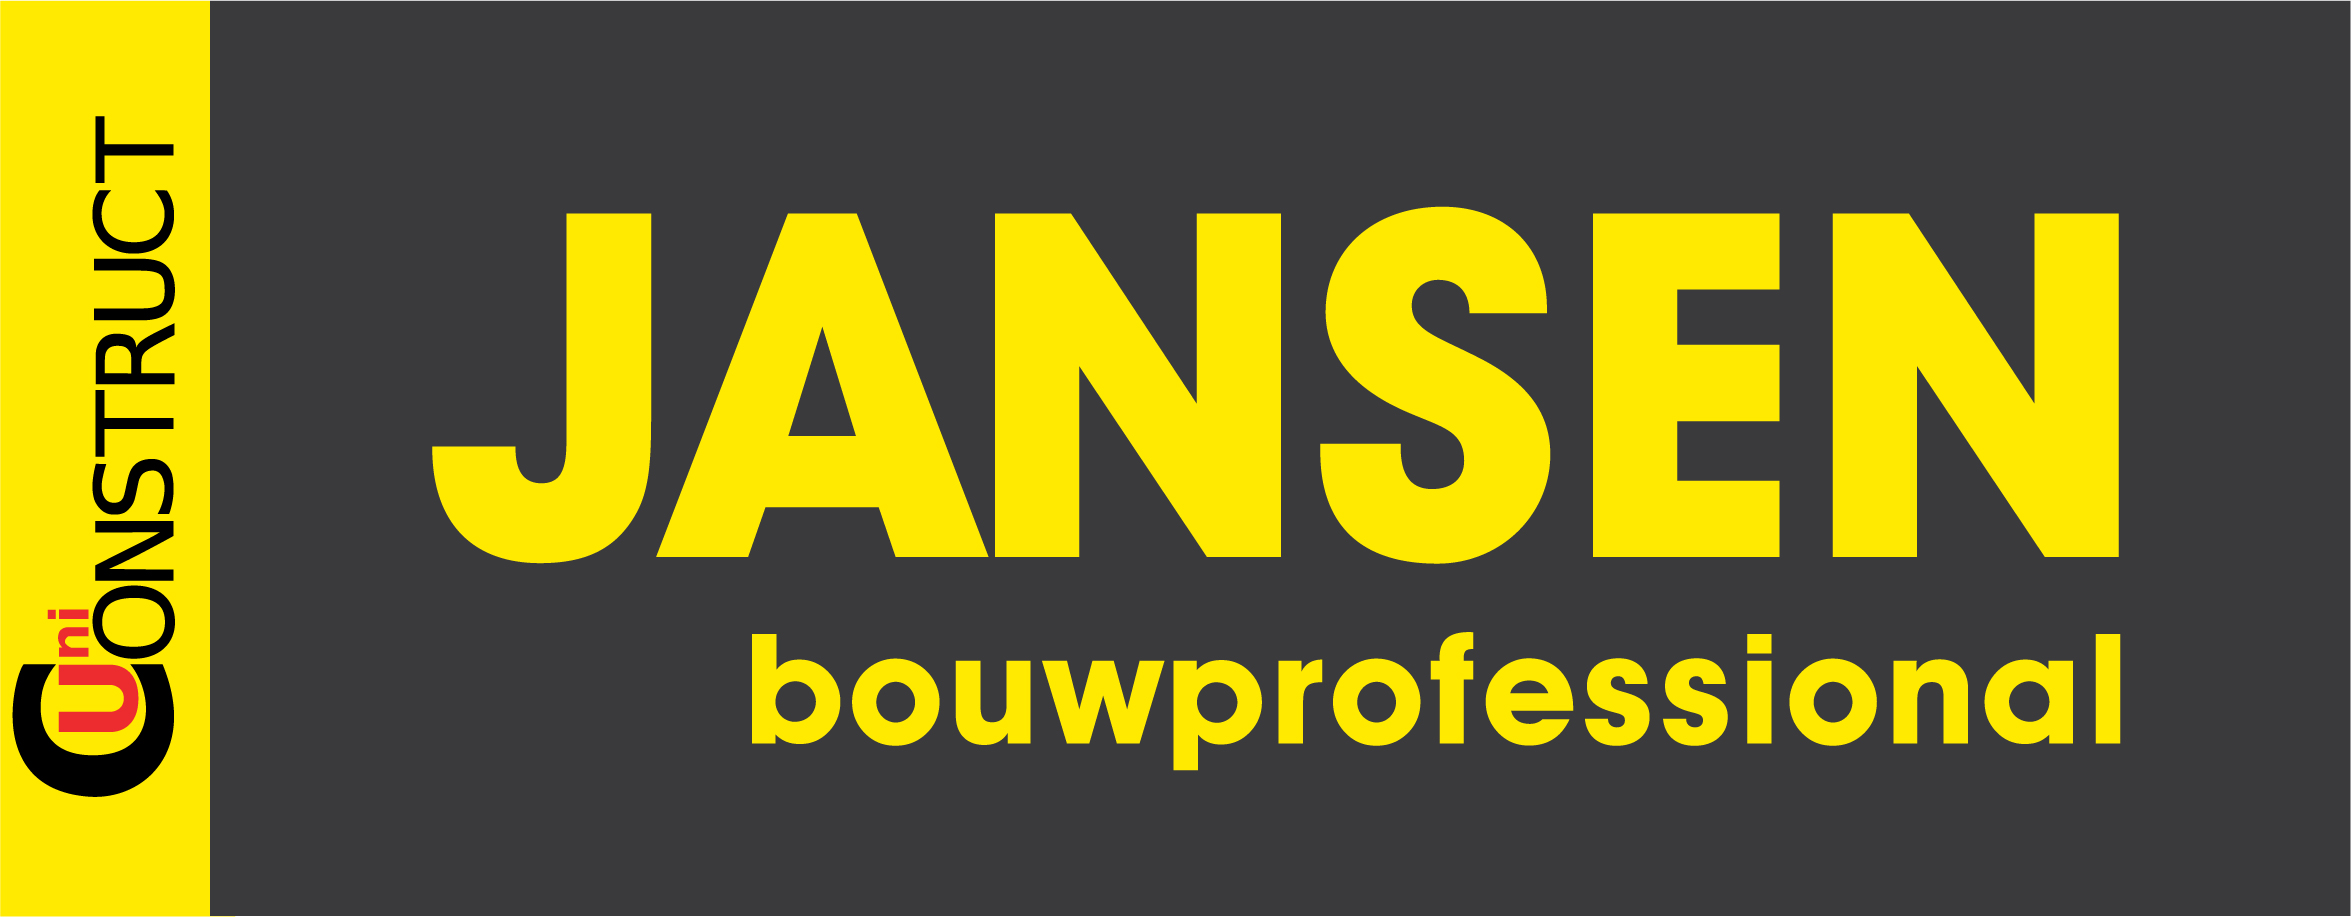 Jansen Bouwprofessional